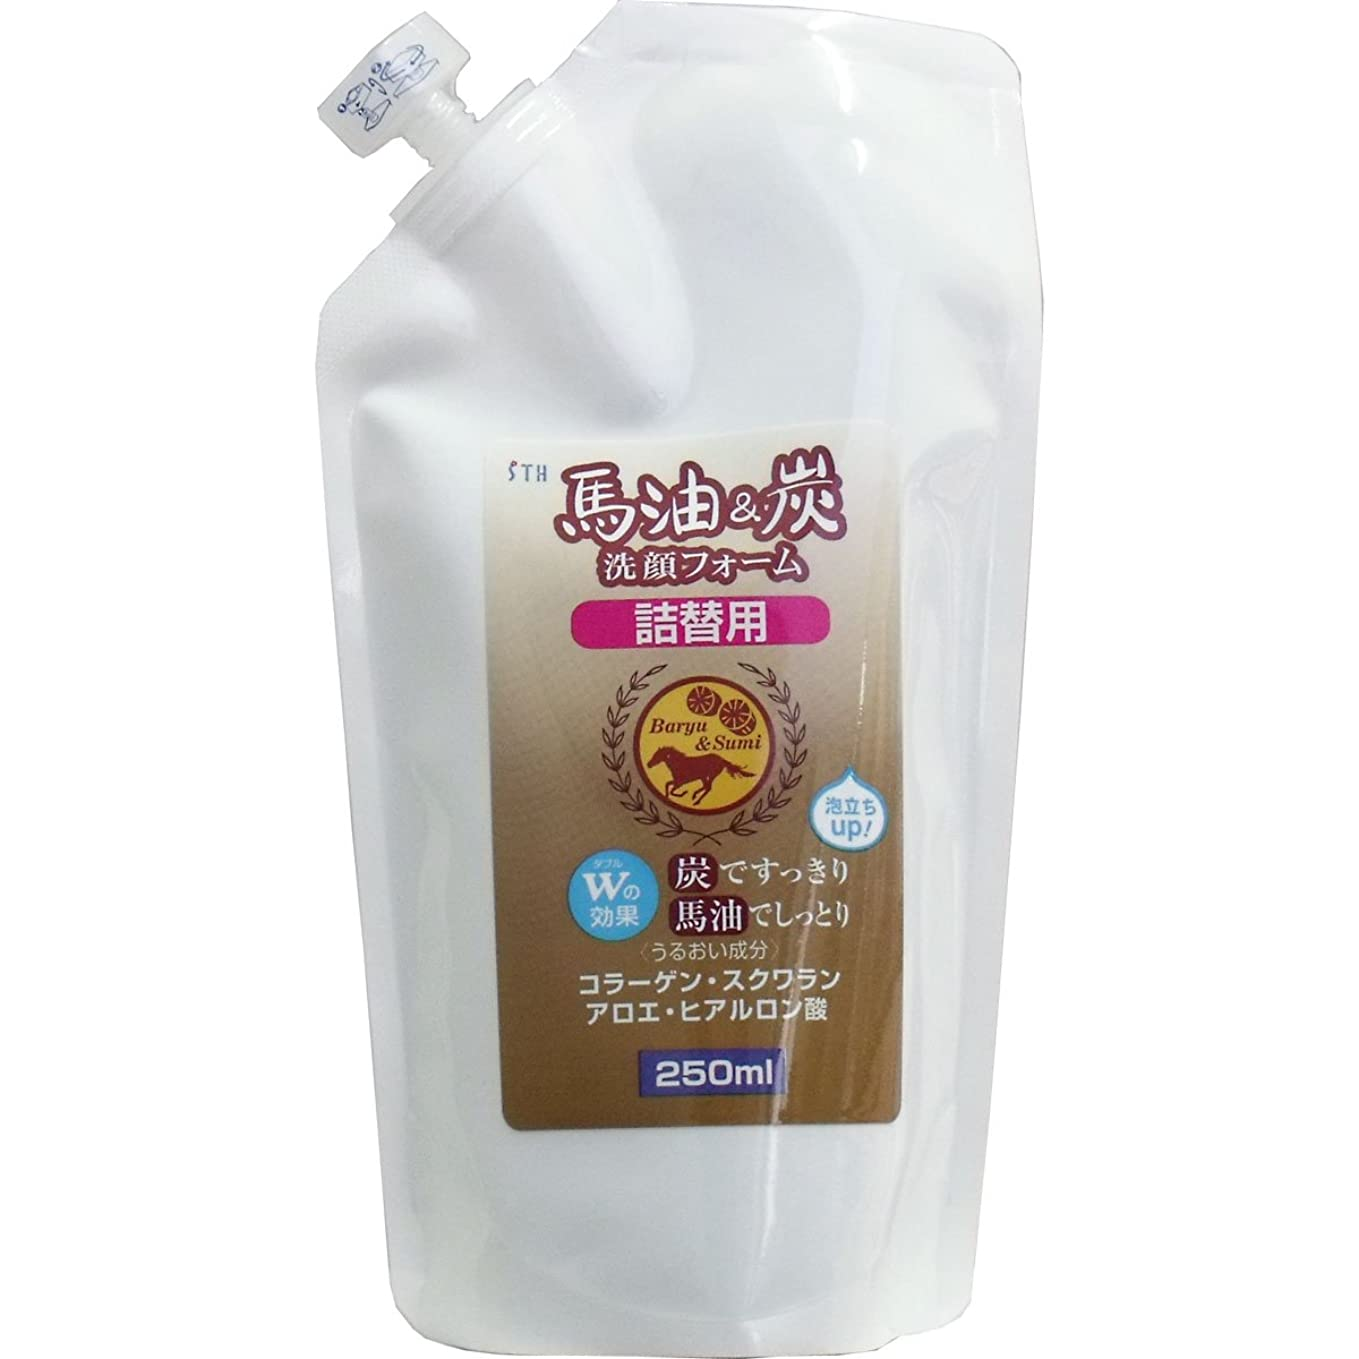 対推進認証馬油&炭洗顔フォーム【詰替用250ml】×2袋